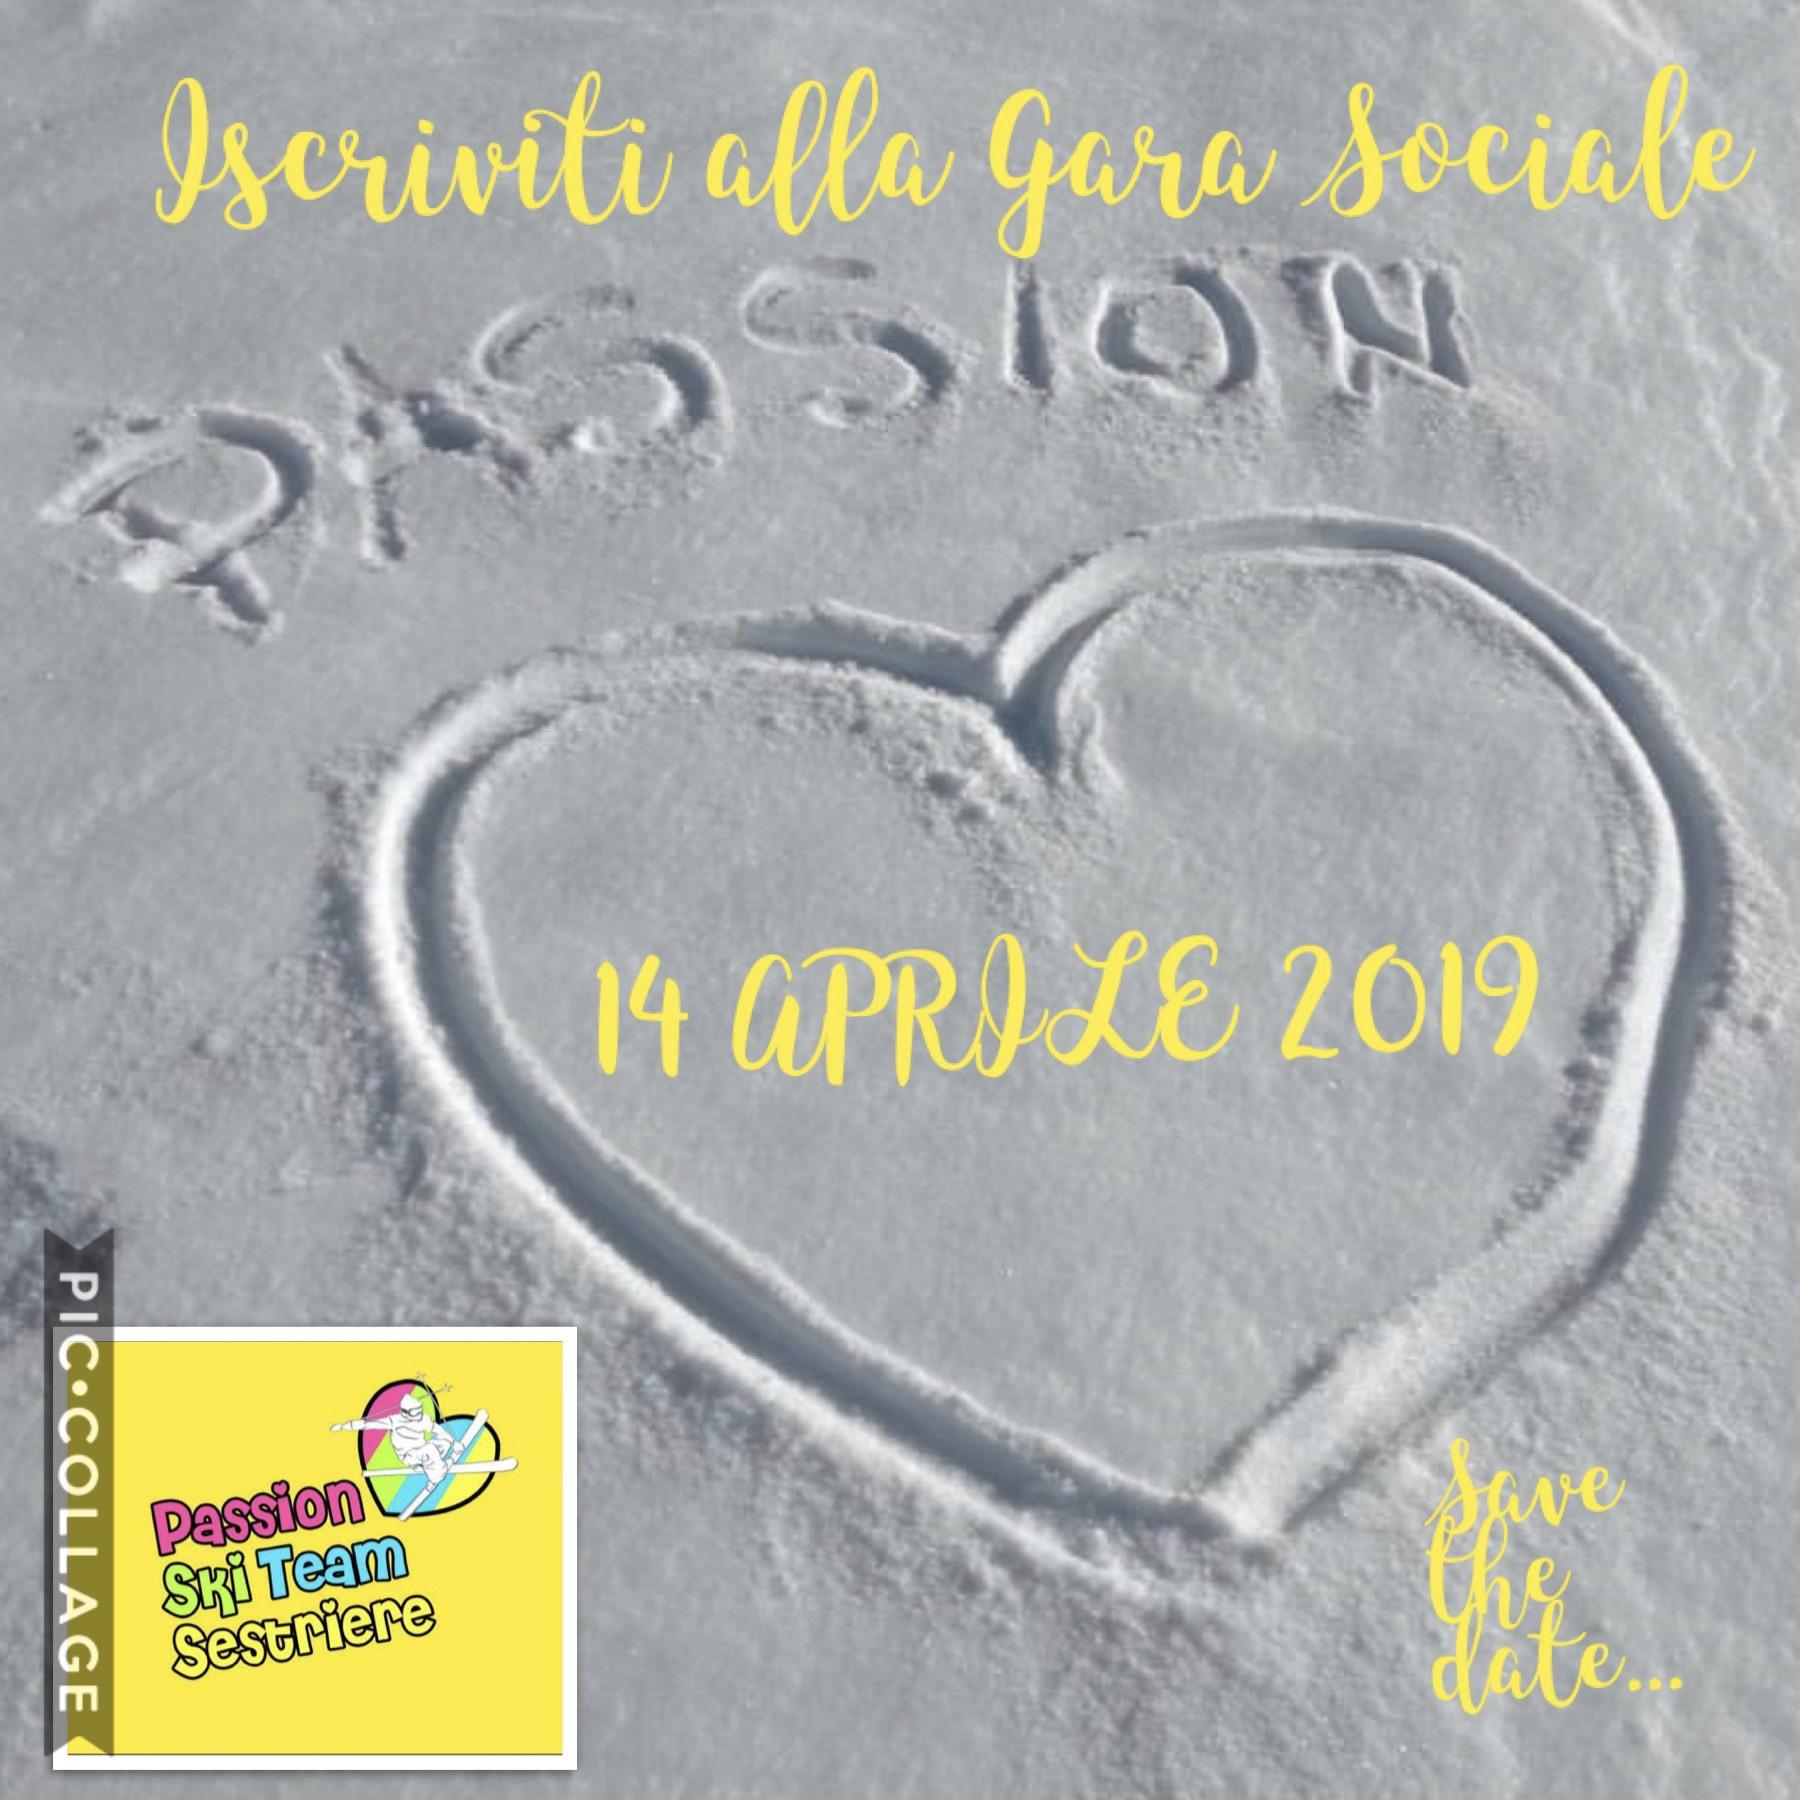 SAVE THE DATE: 14 APRILE 2019 GARA SOCIALE PASSION!